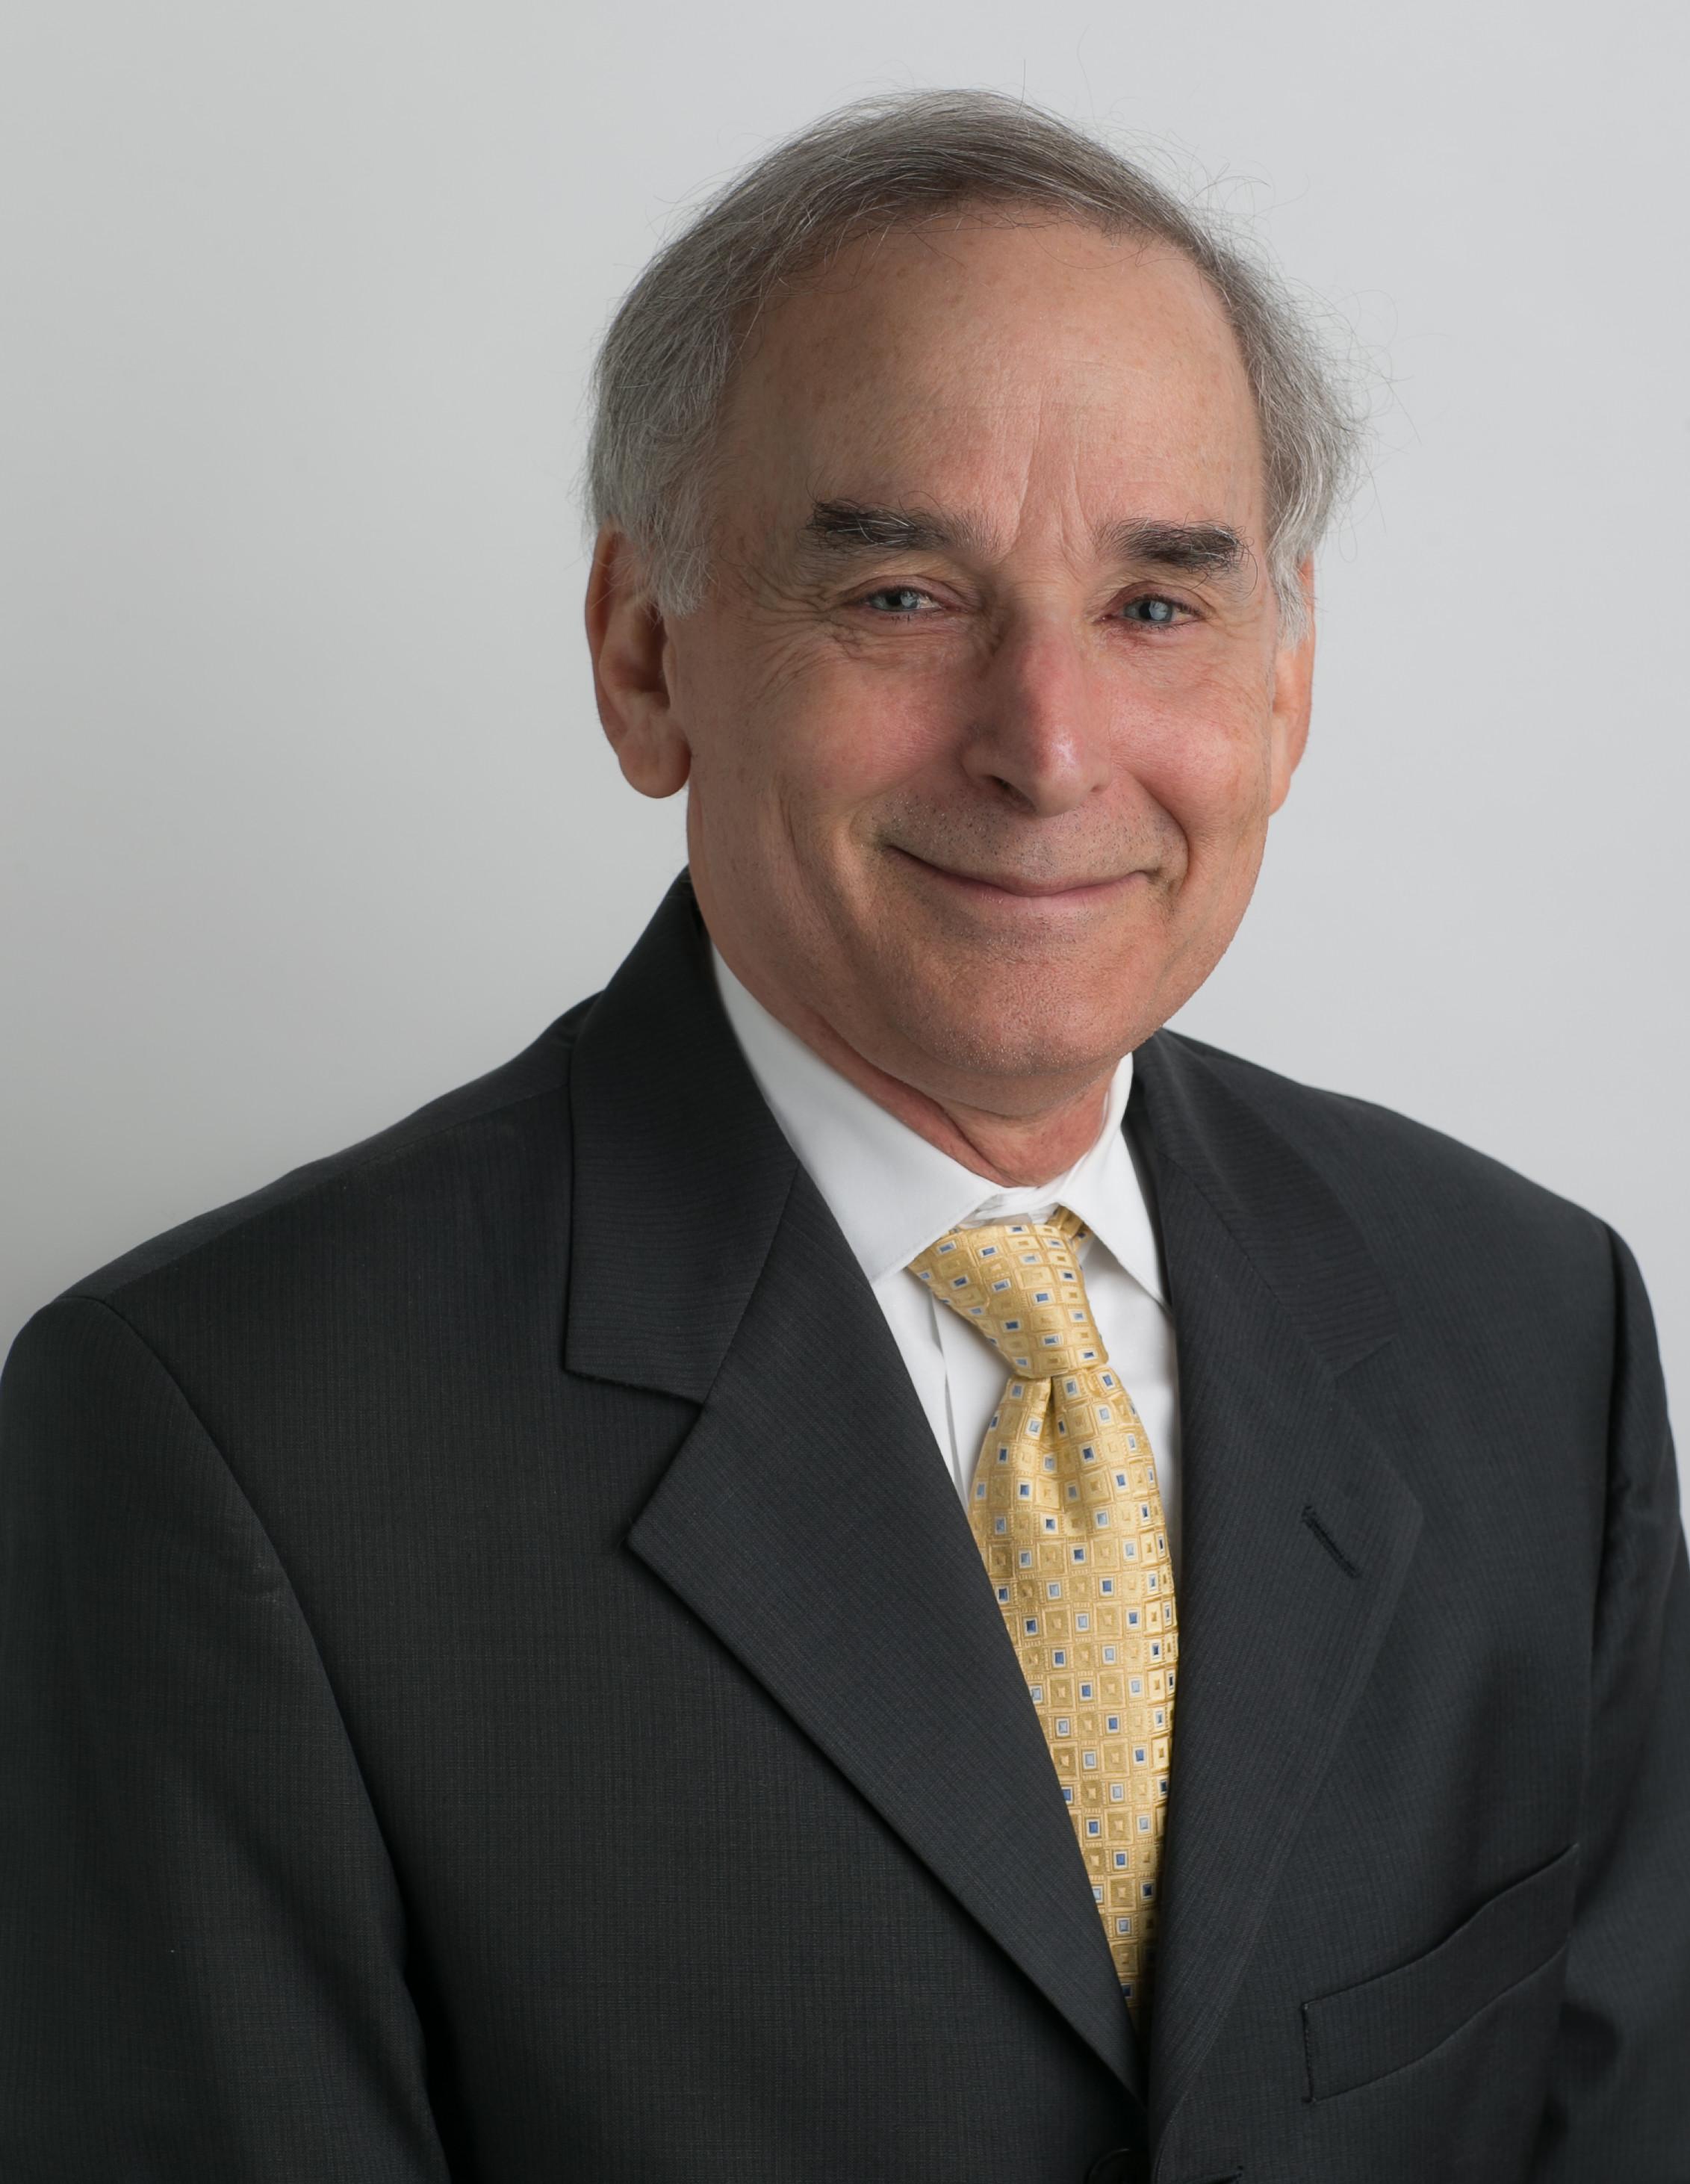 Richard Levine Bio